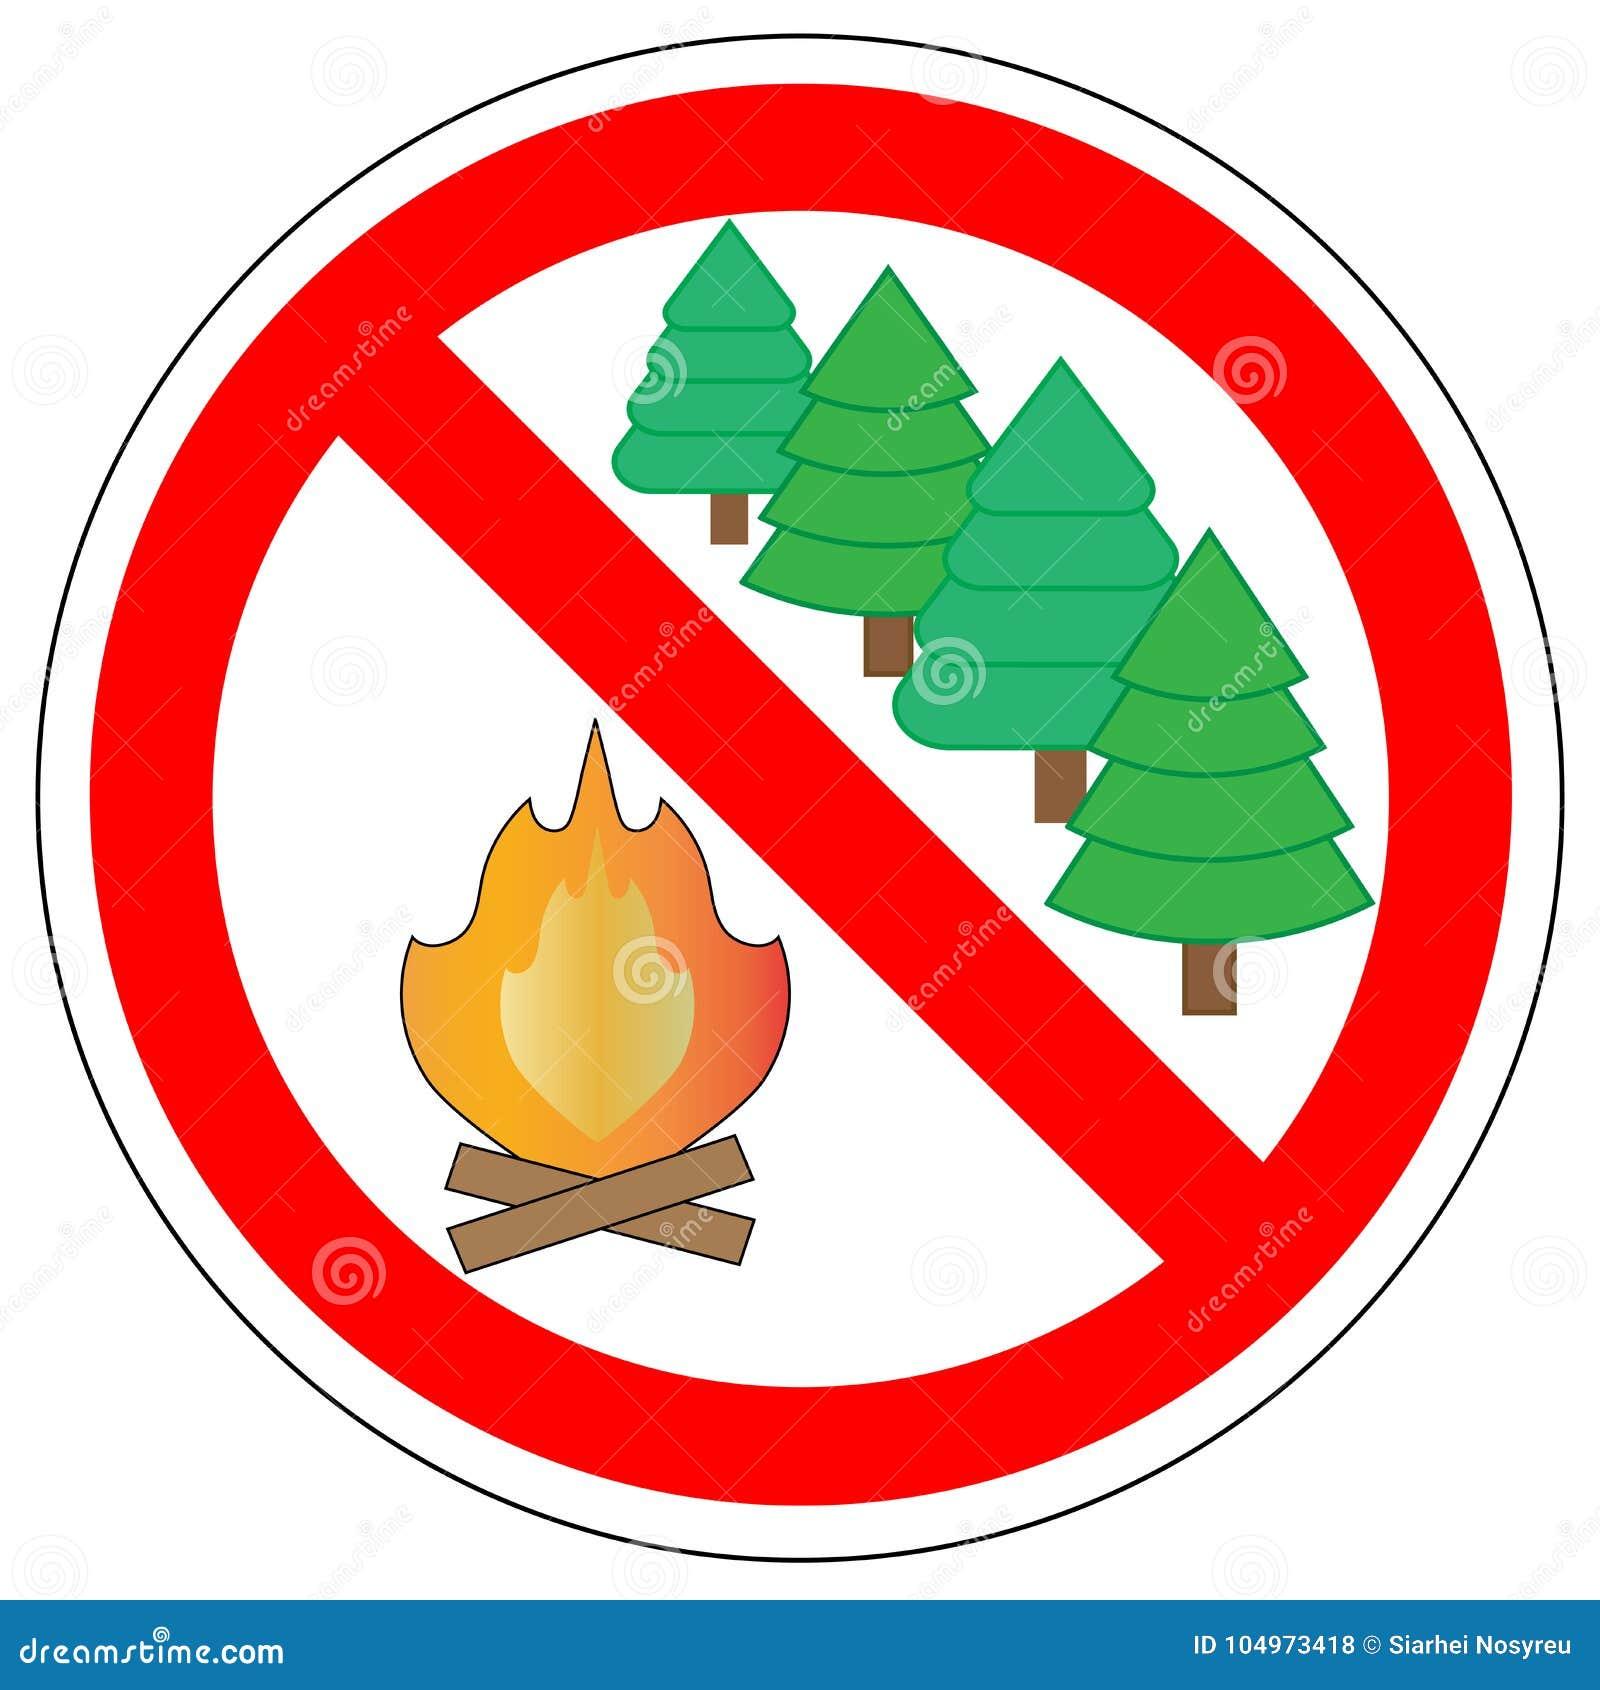 обязана не разводите костры в лесу знак певица